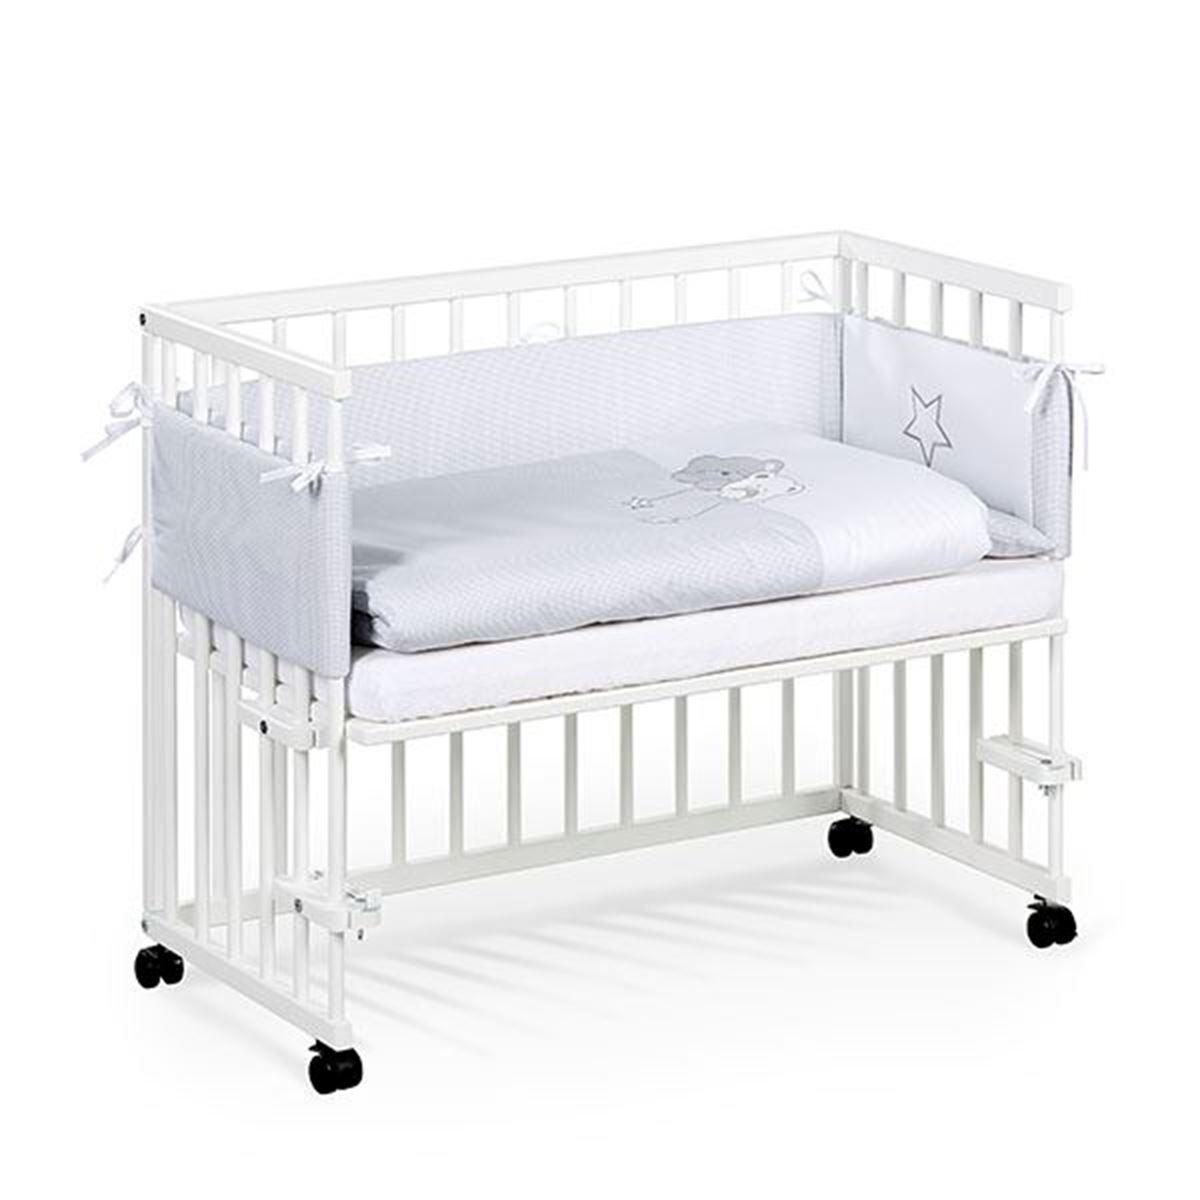 Klups Bedside Cot - Piccolo